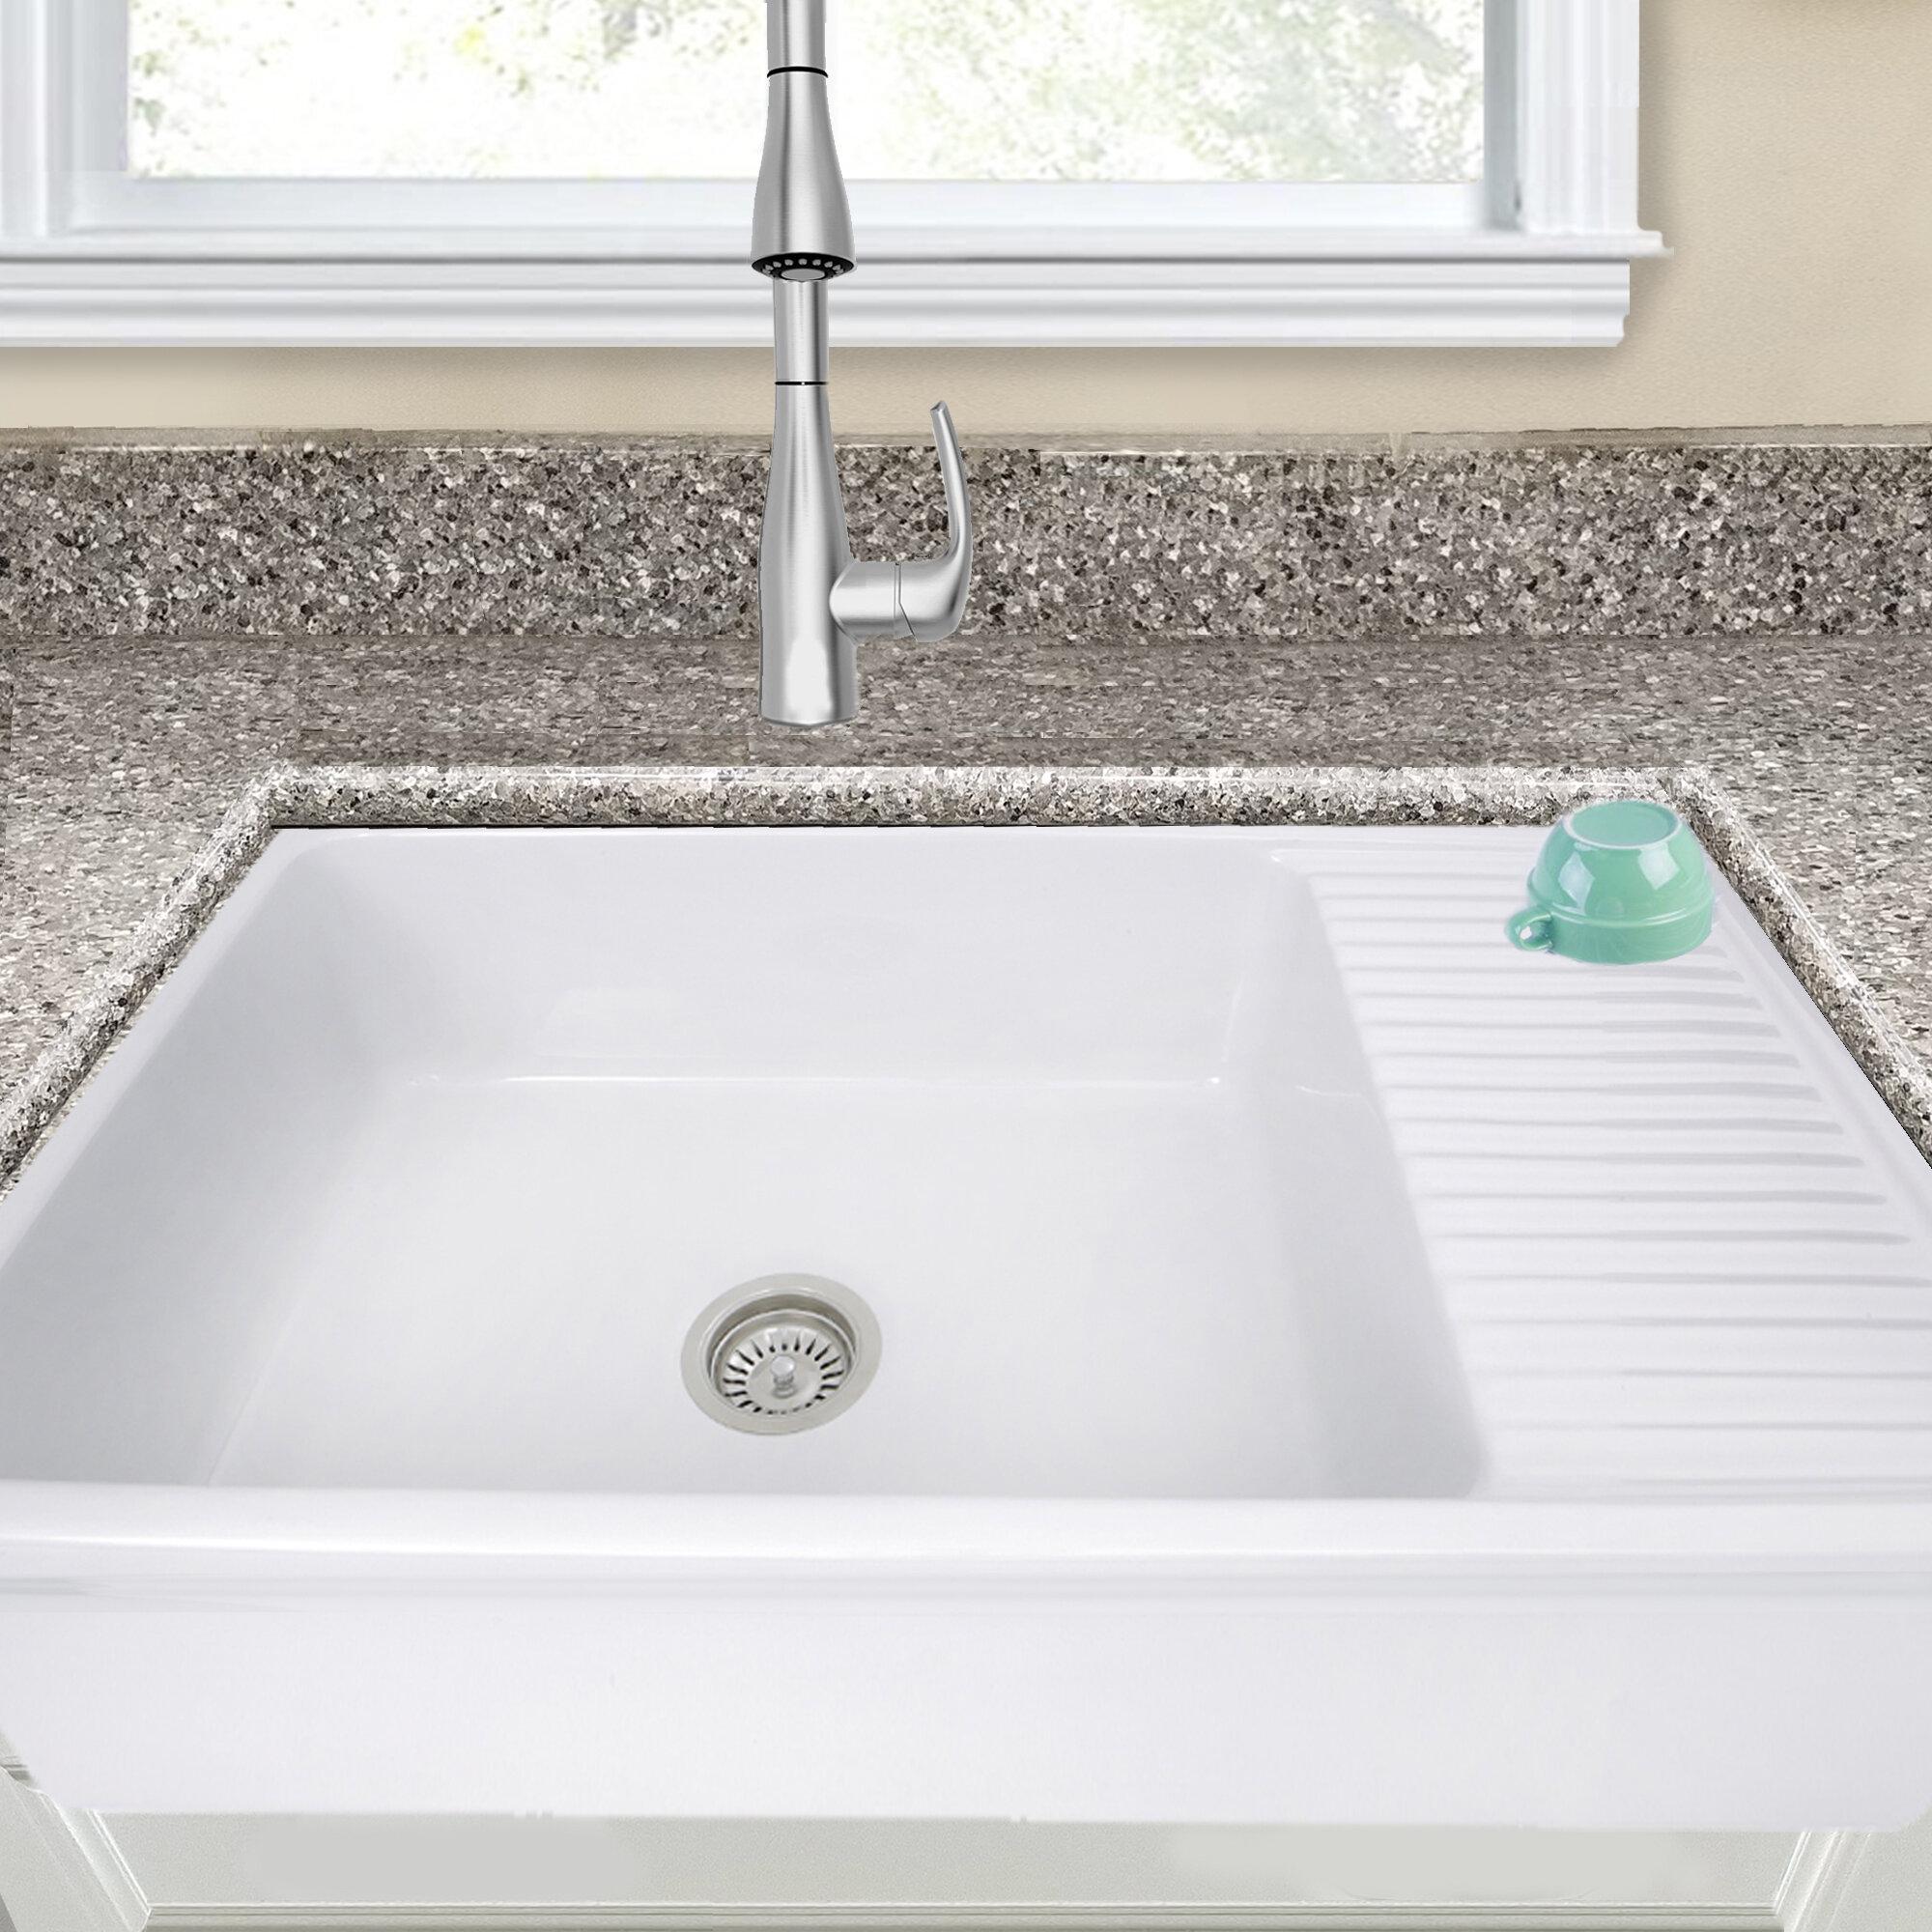 Nantucket Sinks Cape 36 L X 20 W Farmhouse Kitchen Sink With